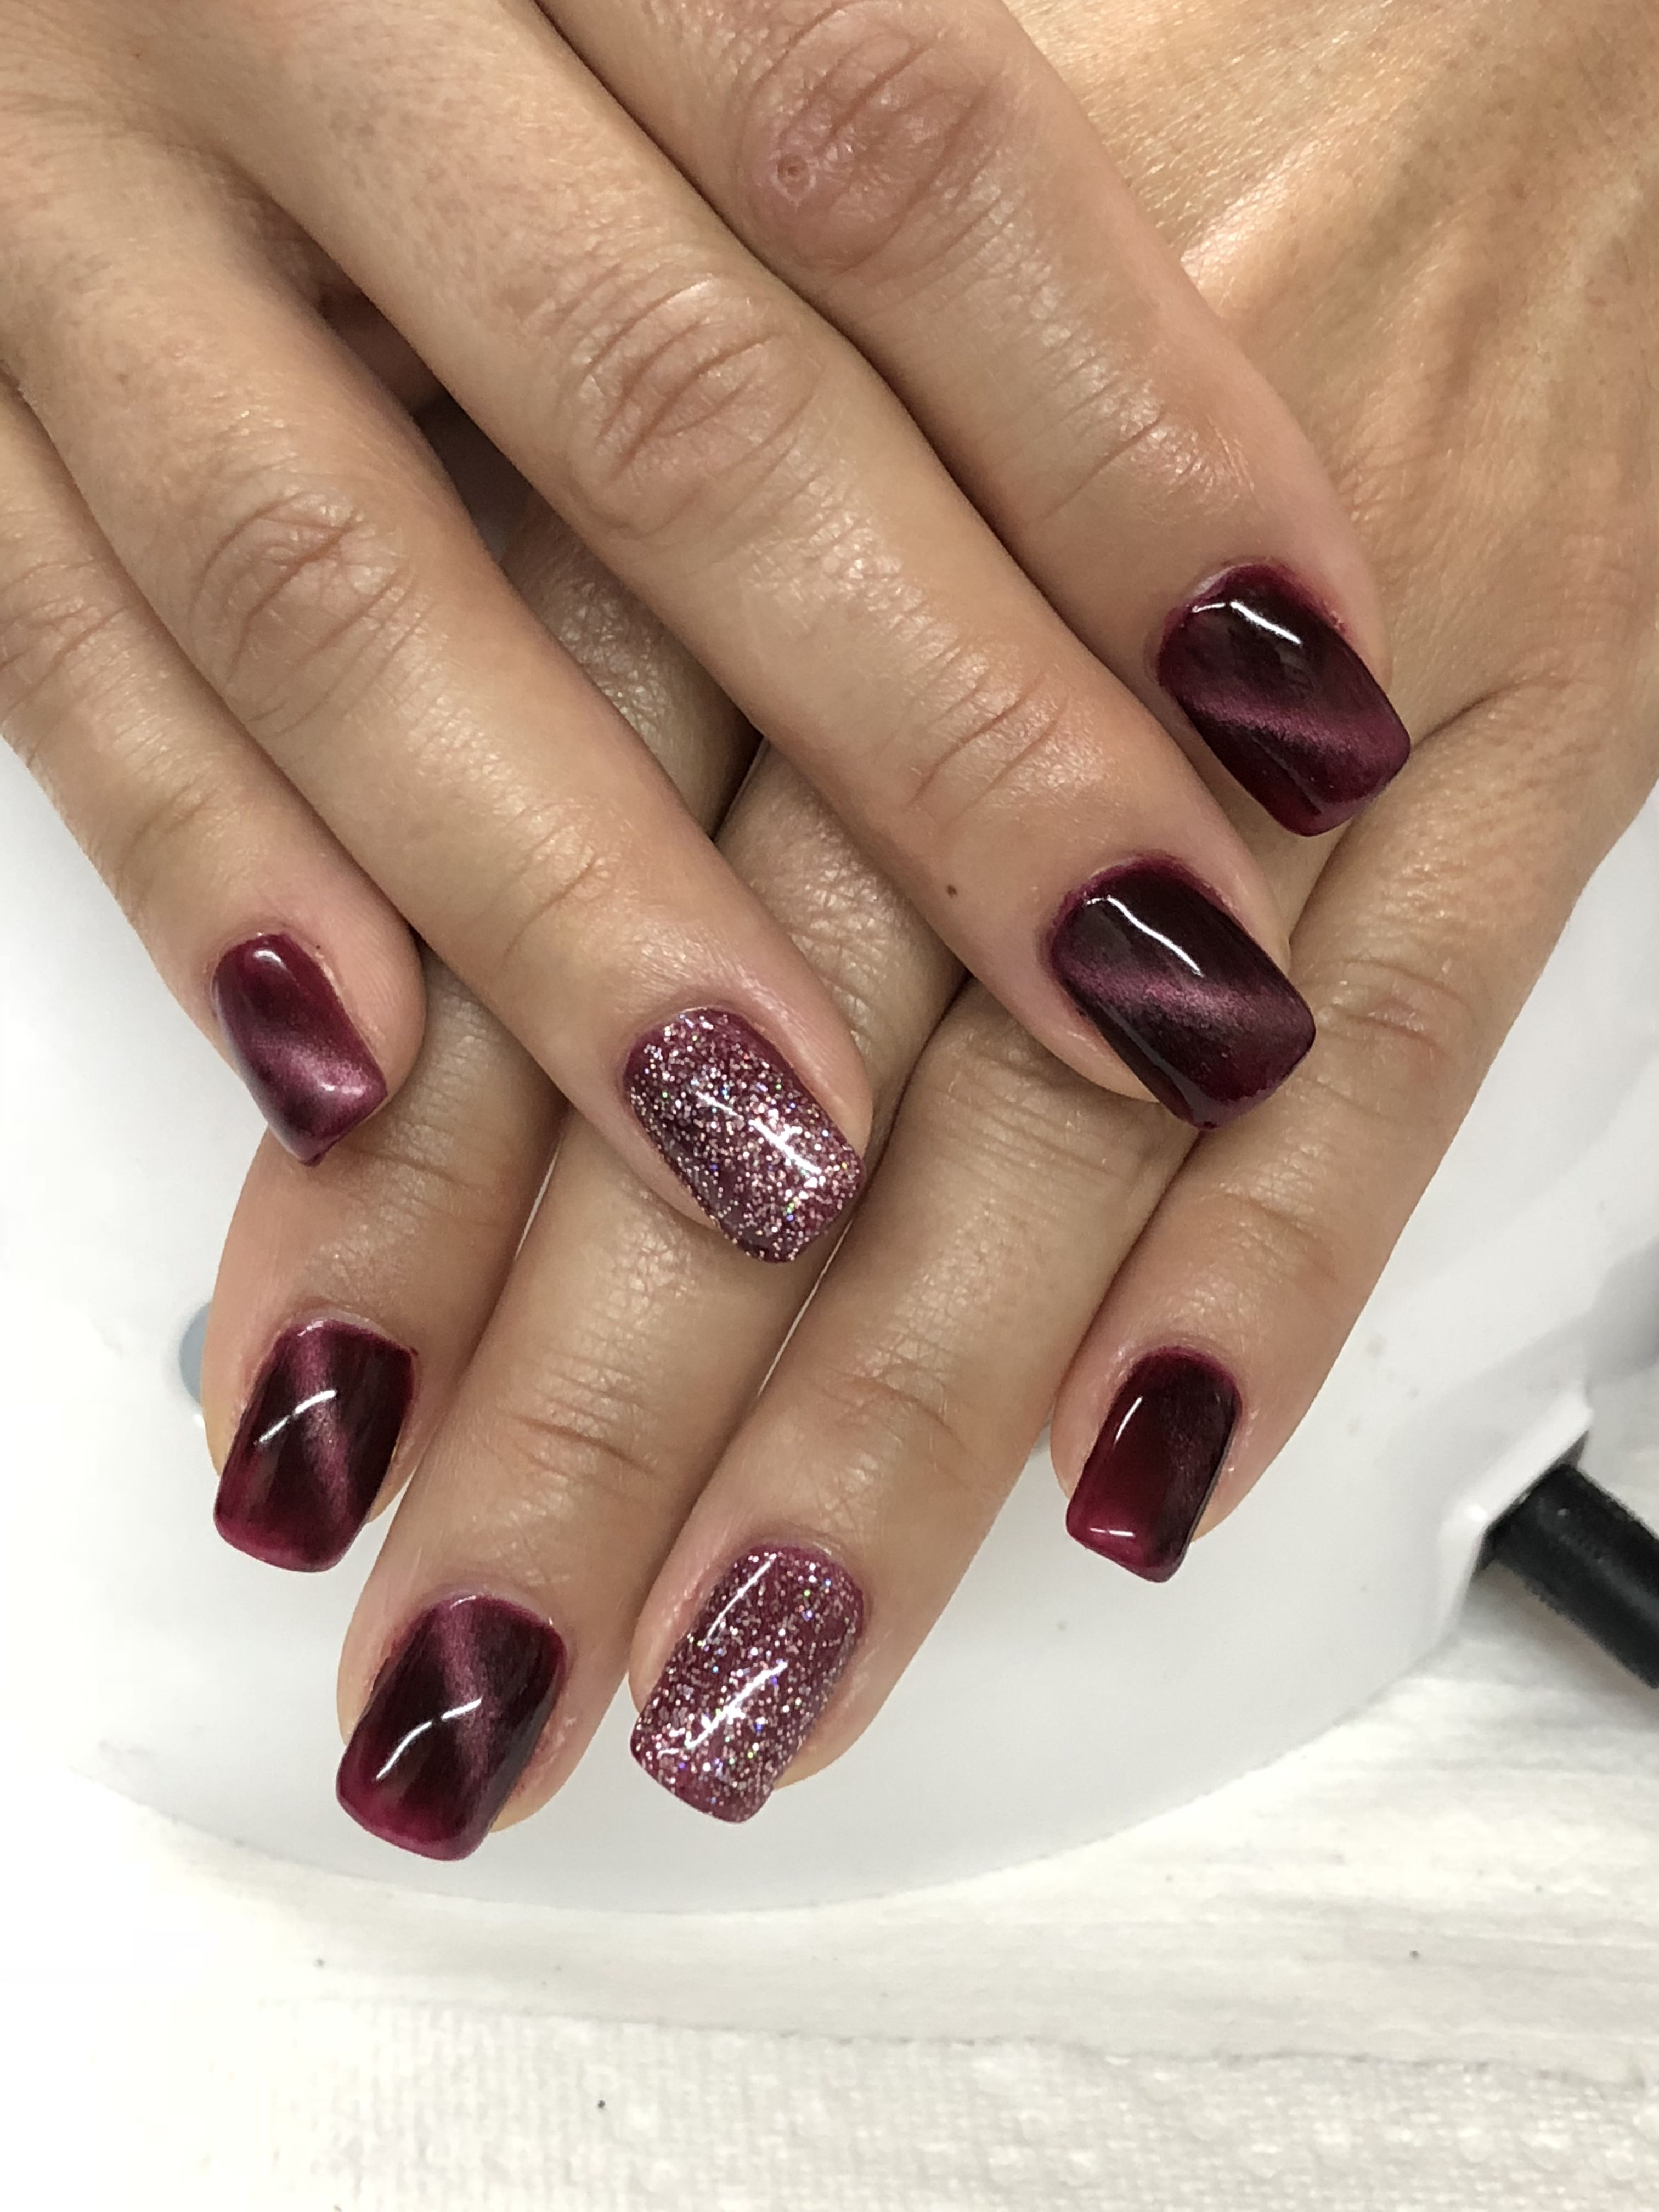 Burgundy Magnetic Fall Glitter Gel Nails Glitter Gel Nails Fall Gel Nails Gel Nail Designs